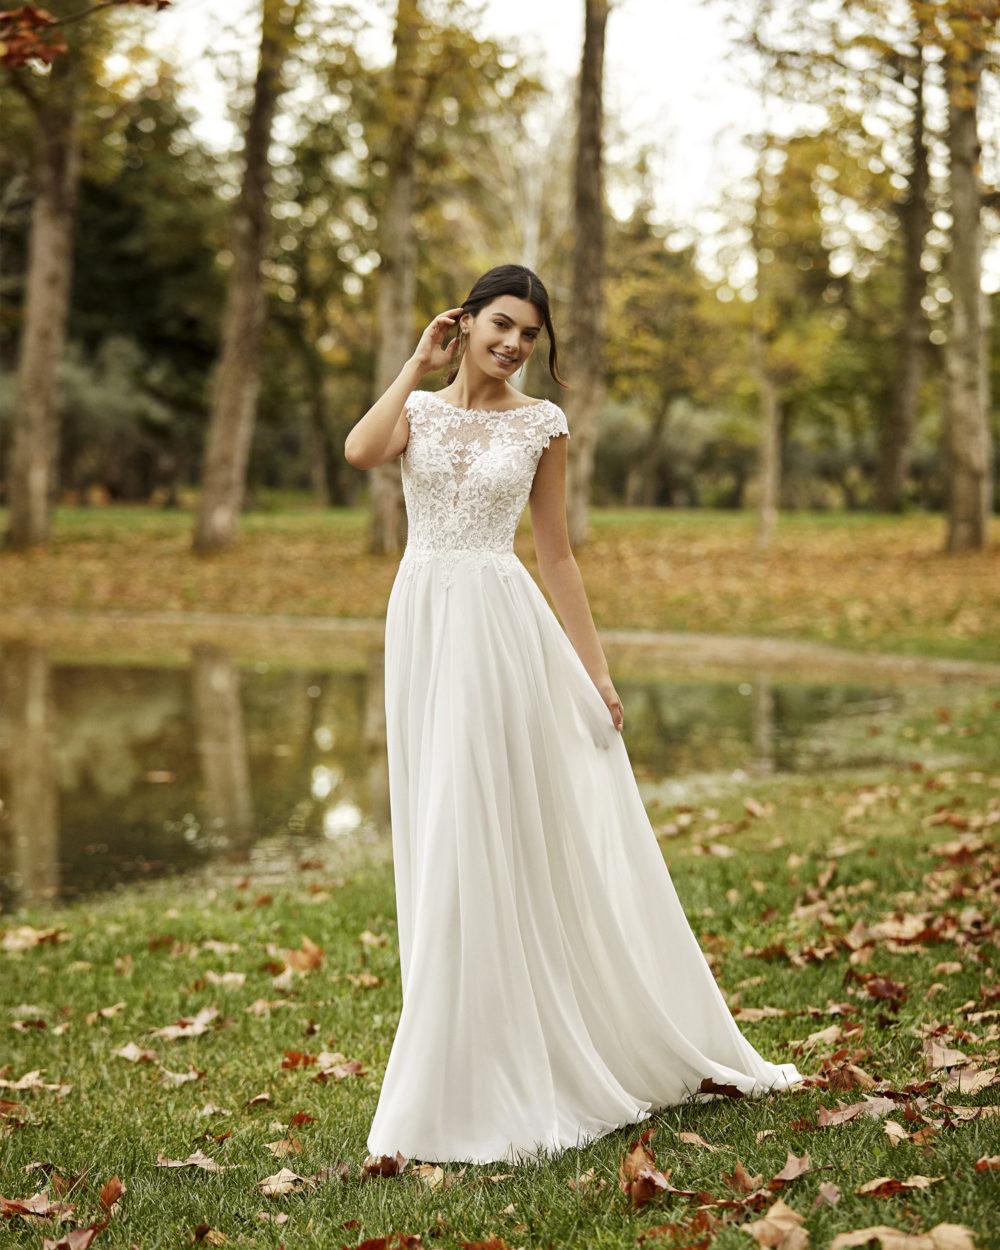 Mariages: abito da sposa Rosa Clarà 2020 a Vicenza, Verona, Padova, Veneto 4B130 OFELIA